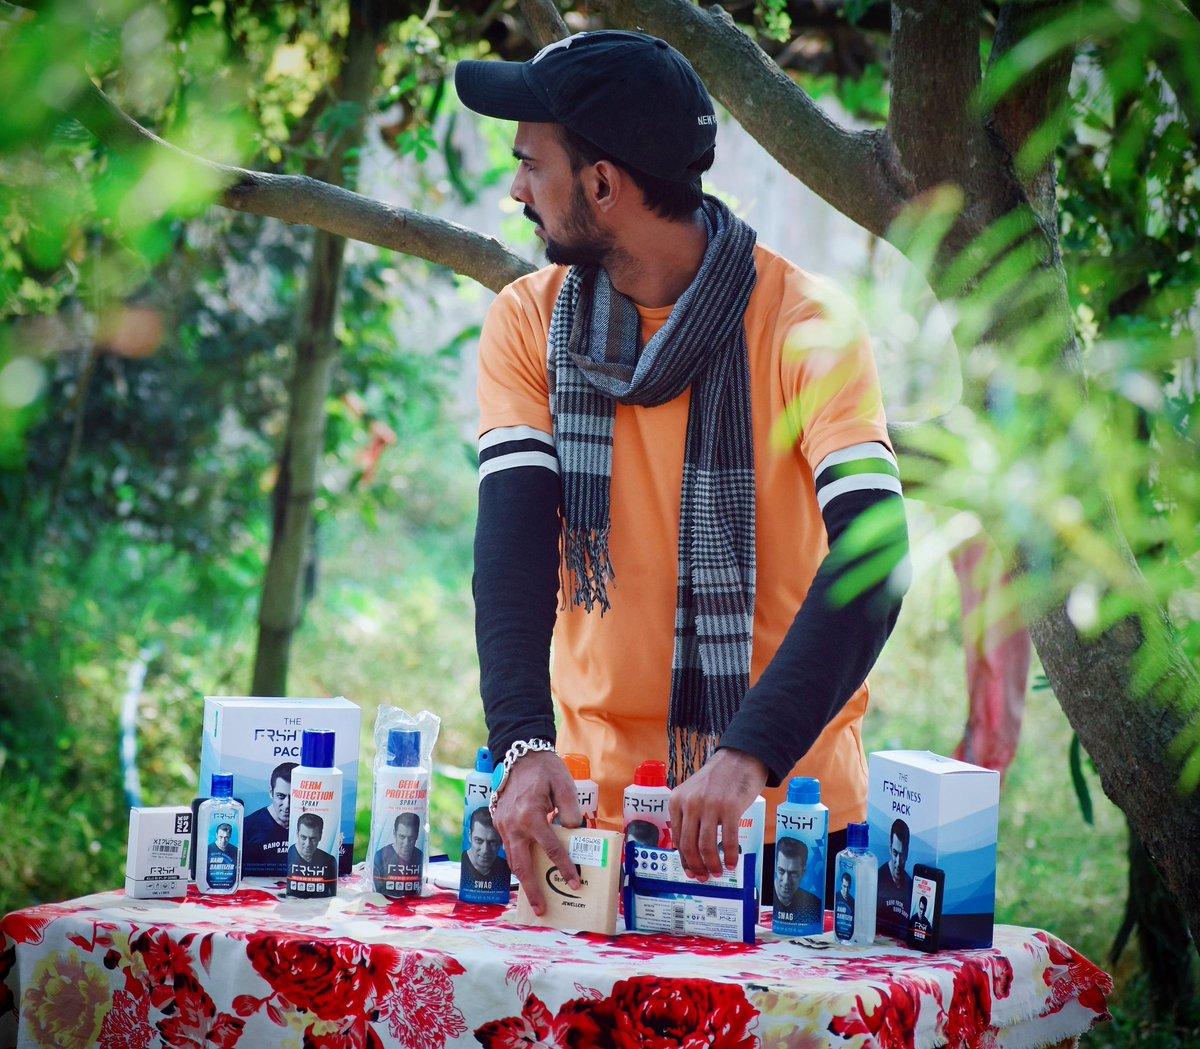 And here is my FRSHness pack 😍 Bhai Ne Bola Kharidne Kaa Toh Kharidane ka.....   Get ready to feel the FRSHness #RahoFRSH #RahoSafe  #SalmanKhan #ManWithGoldenHeart💛  @Being_Rohitp @SabinaLamba @SalmansCombat  @Salmaaankhanfan @Skfcbihar @SalmanKhanCity @FrshGrooming